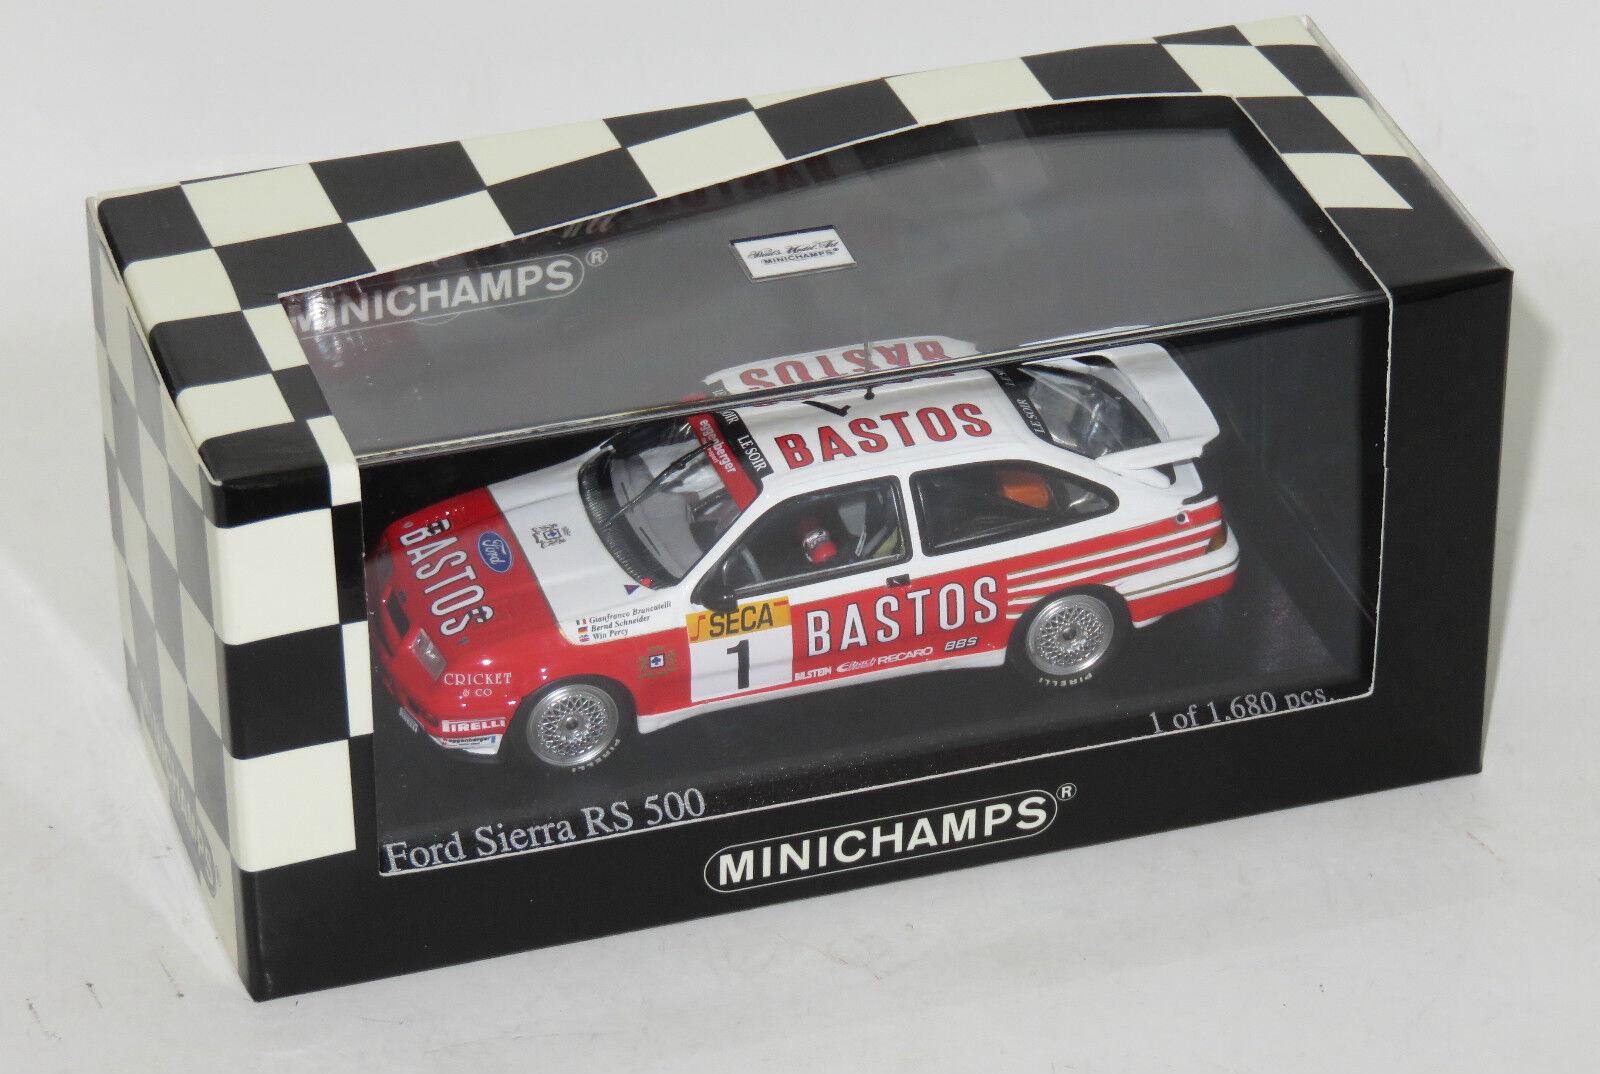 1/43 FORD SIERRA RS500 Bastos  1 24 ore SPA vincitori 1989